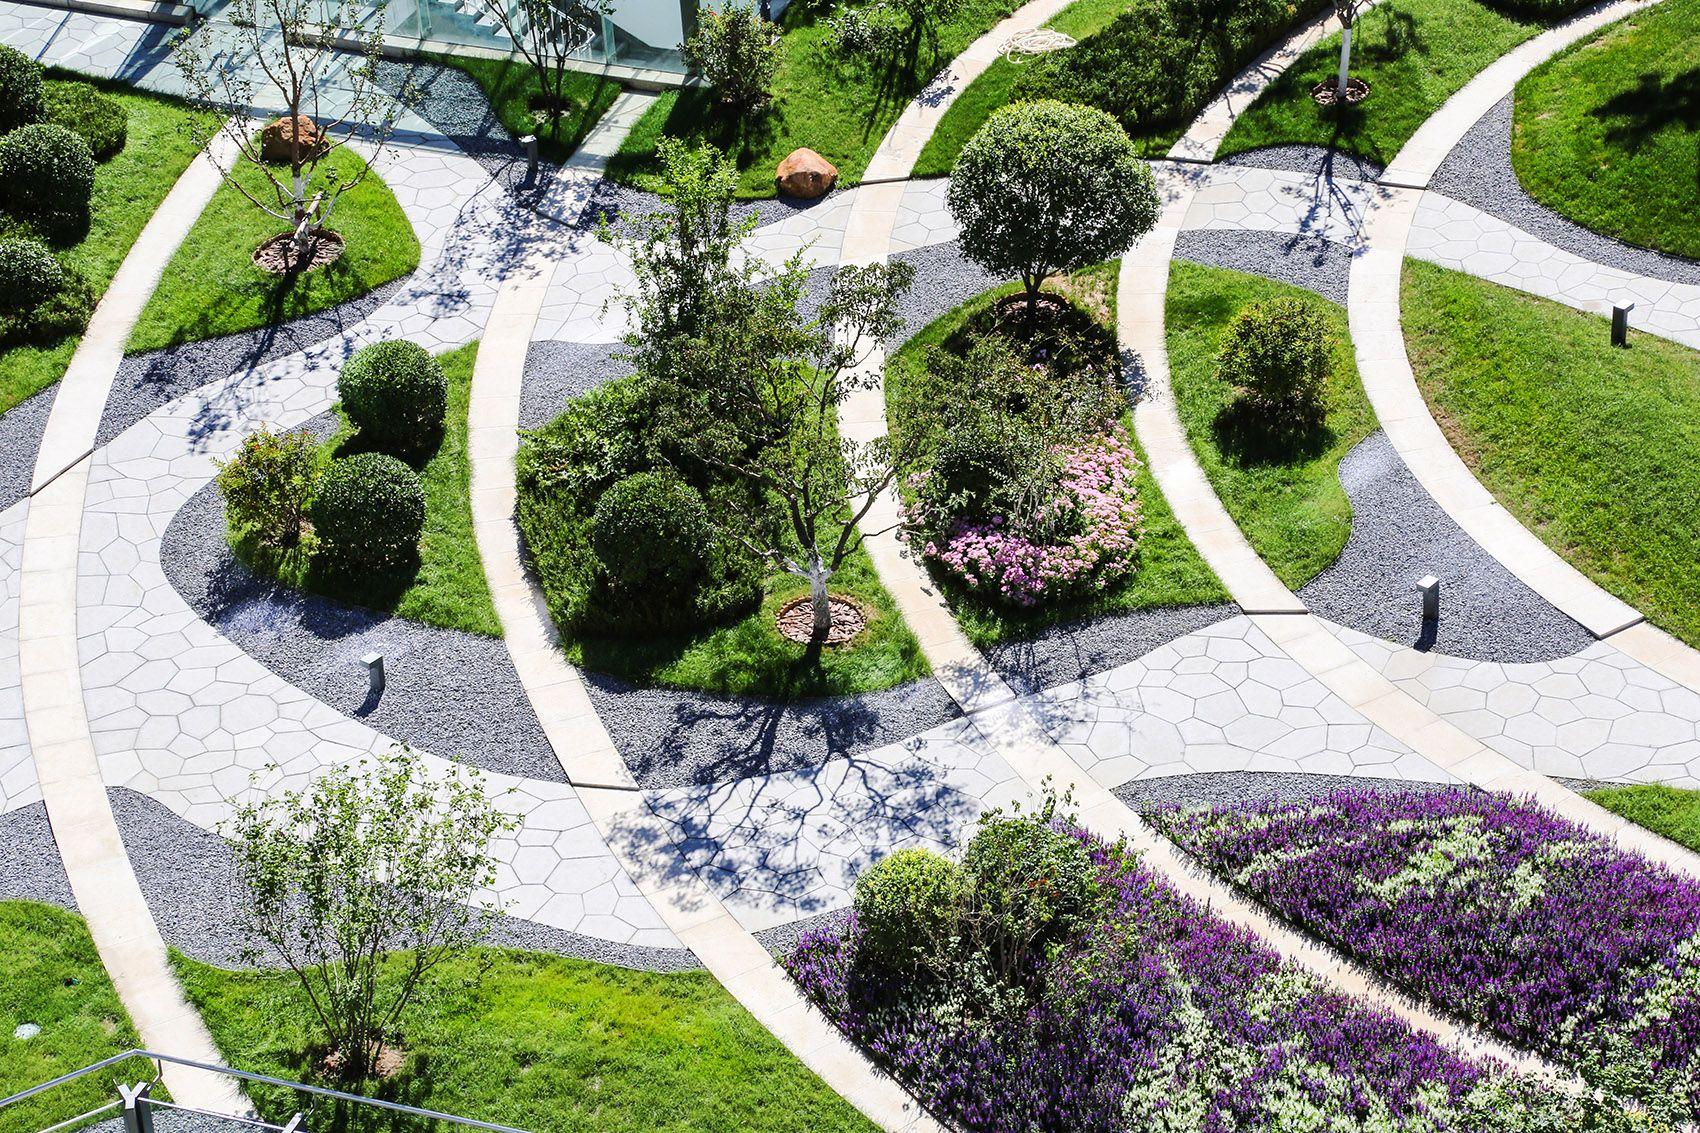 004 Central Gardenscape For Taikang Business School By Farmerson Architects Jpg 1700 1133 Landshaftnaya Arhitektura Gorodskaya Arhitektura Landshaft